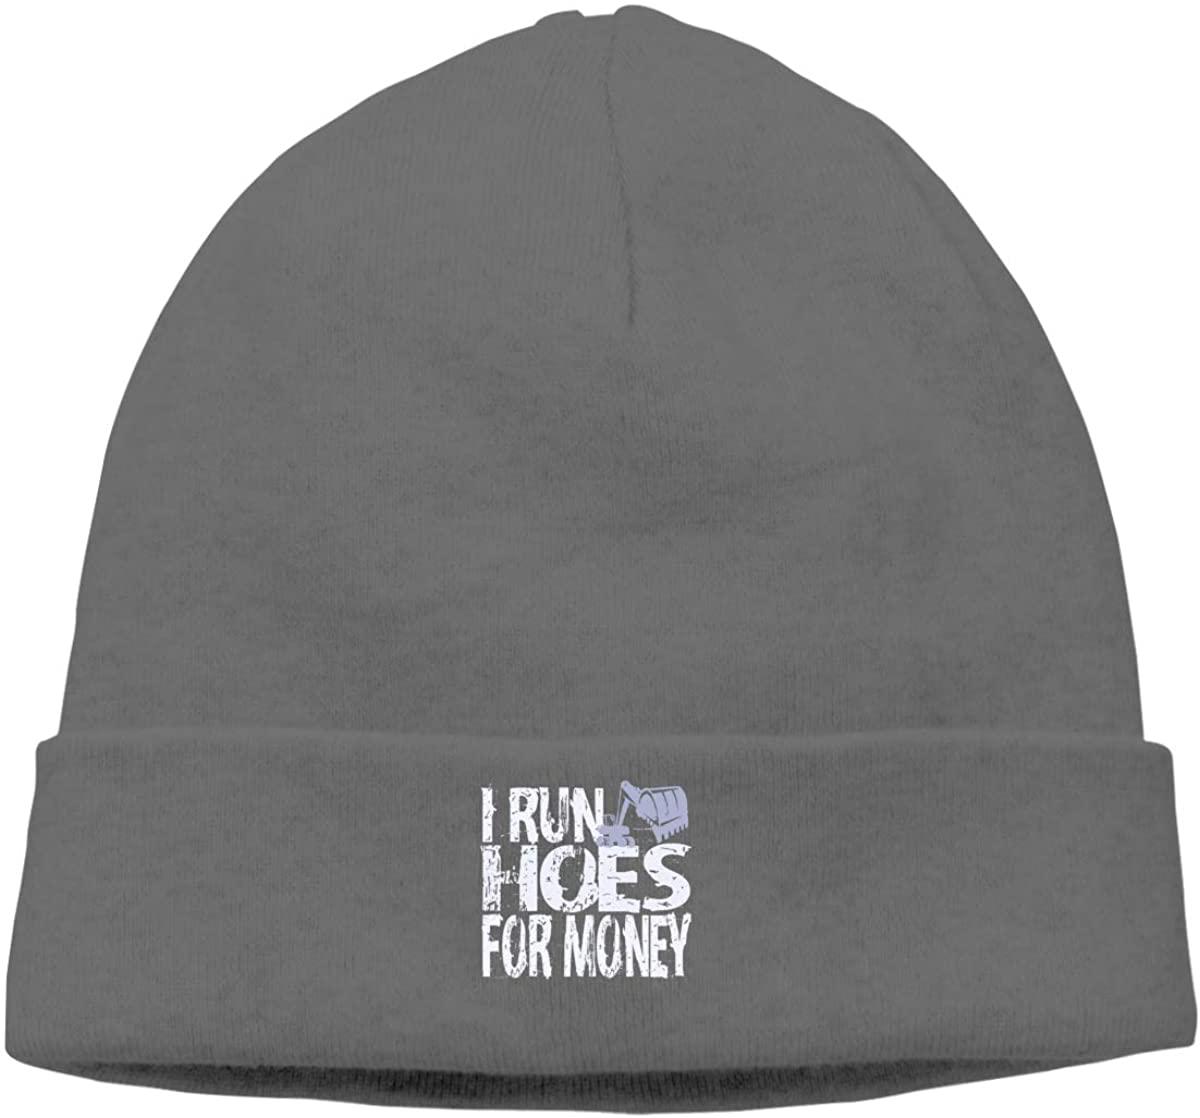 FOECBIR Stretchy Caps Men & Women I Just Baked You Some Shut The Fucupcakes Beanies Hat